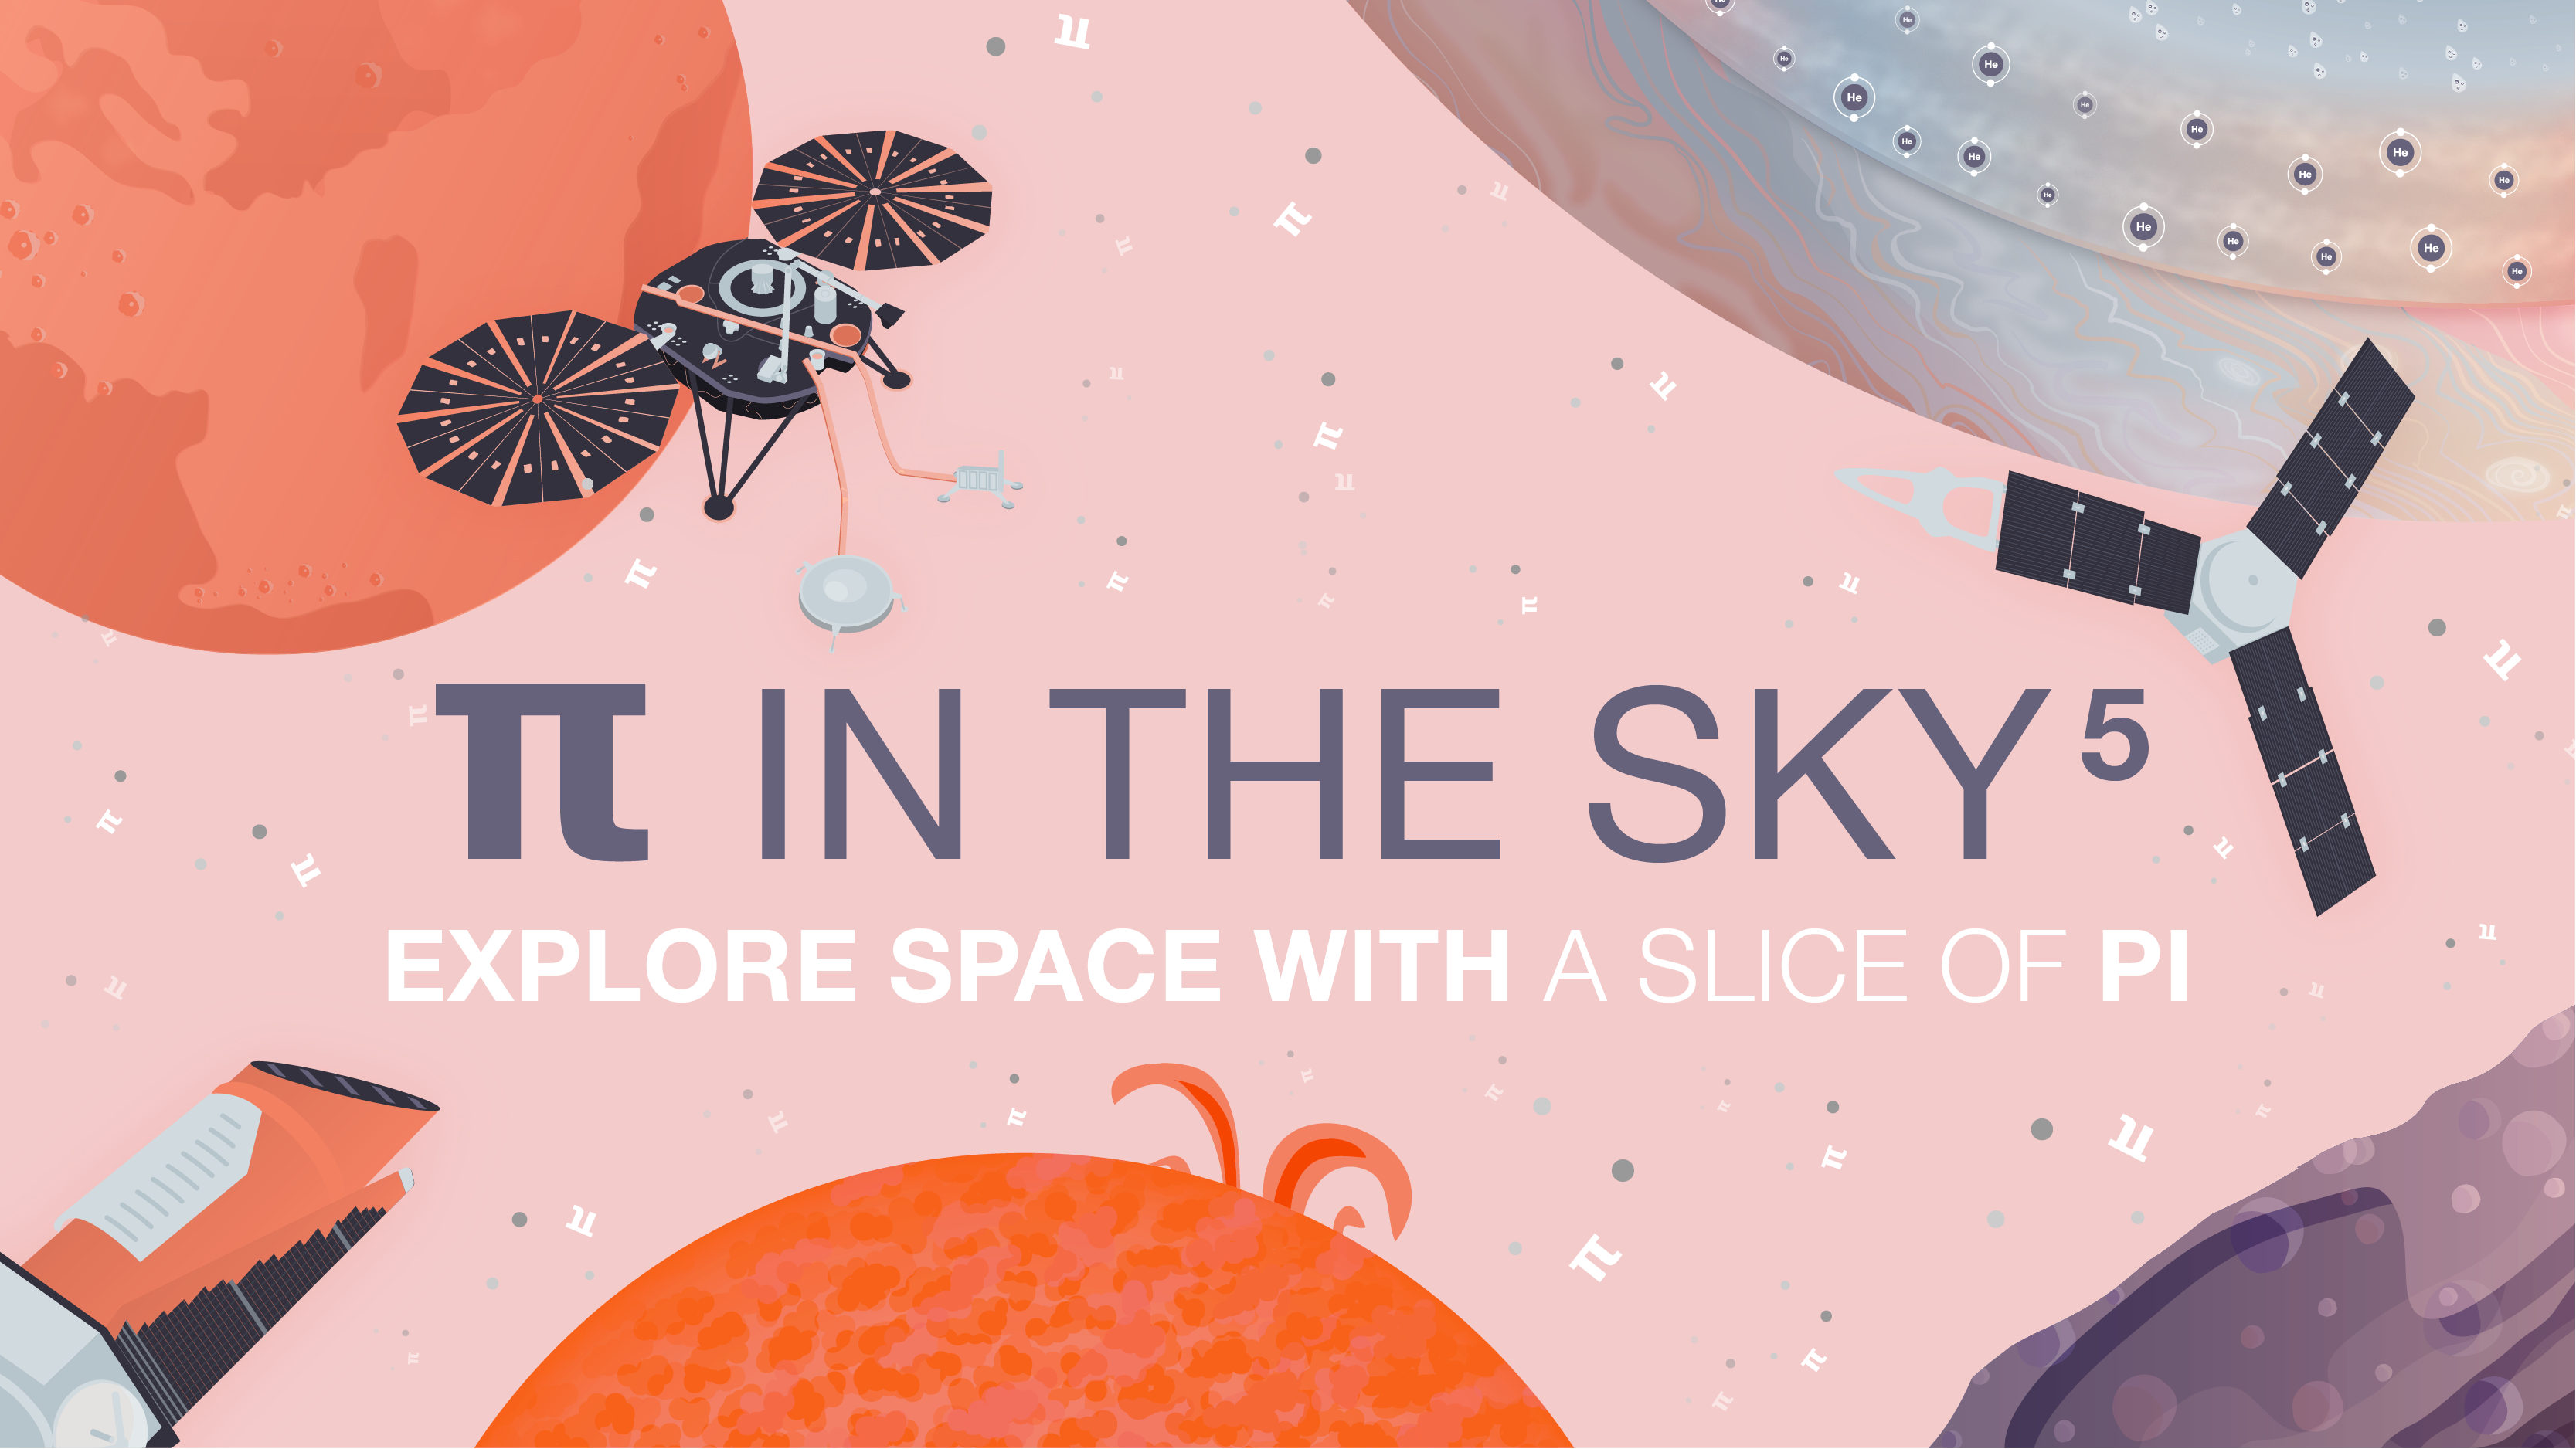 Pi Day: Celebrate Pi Day With NASA Public Event